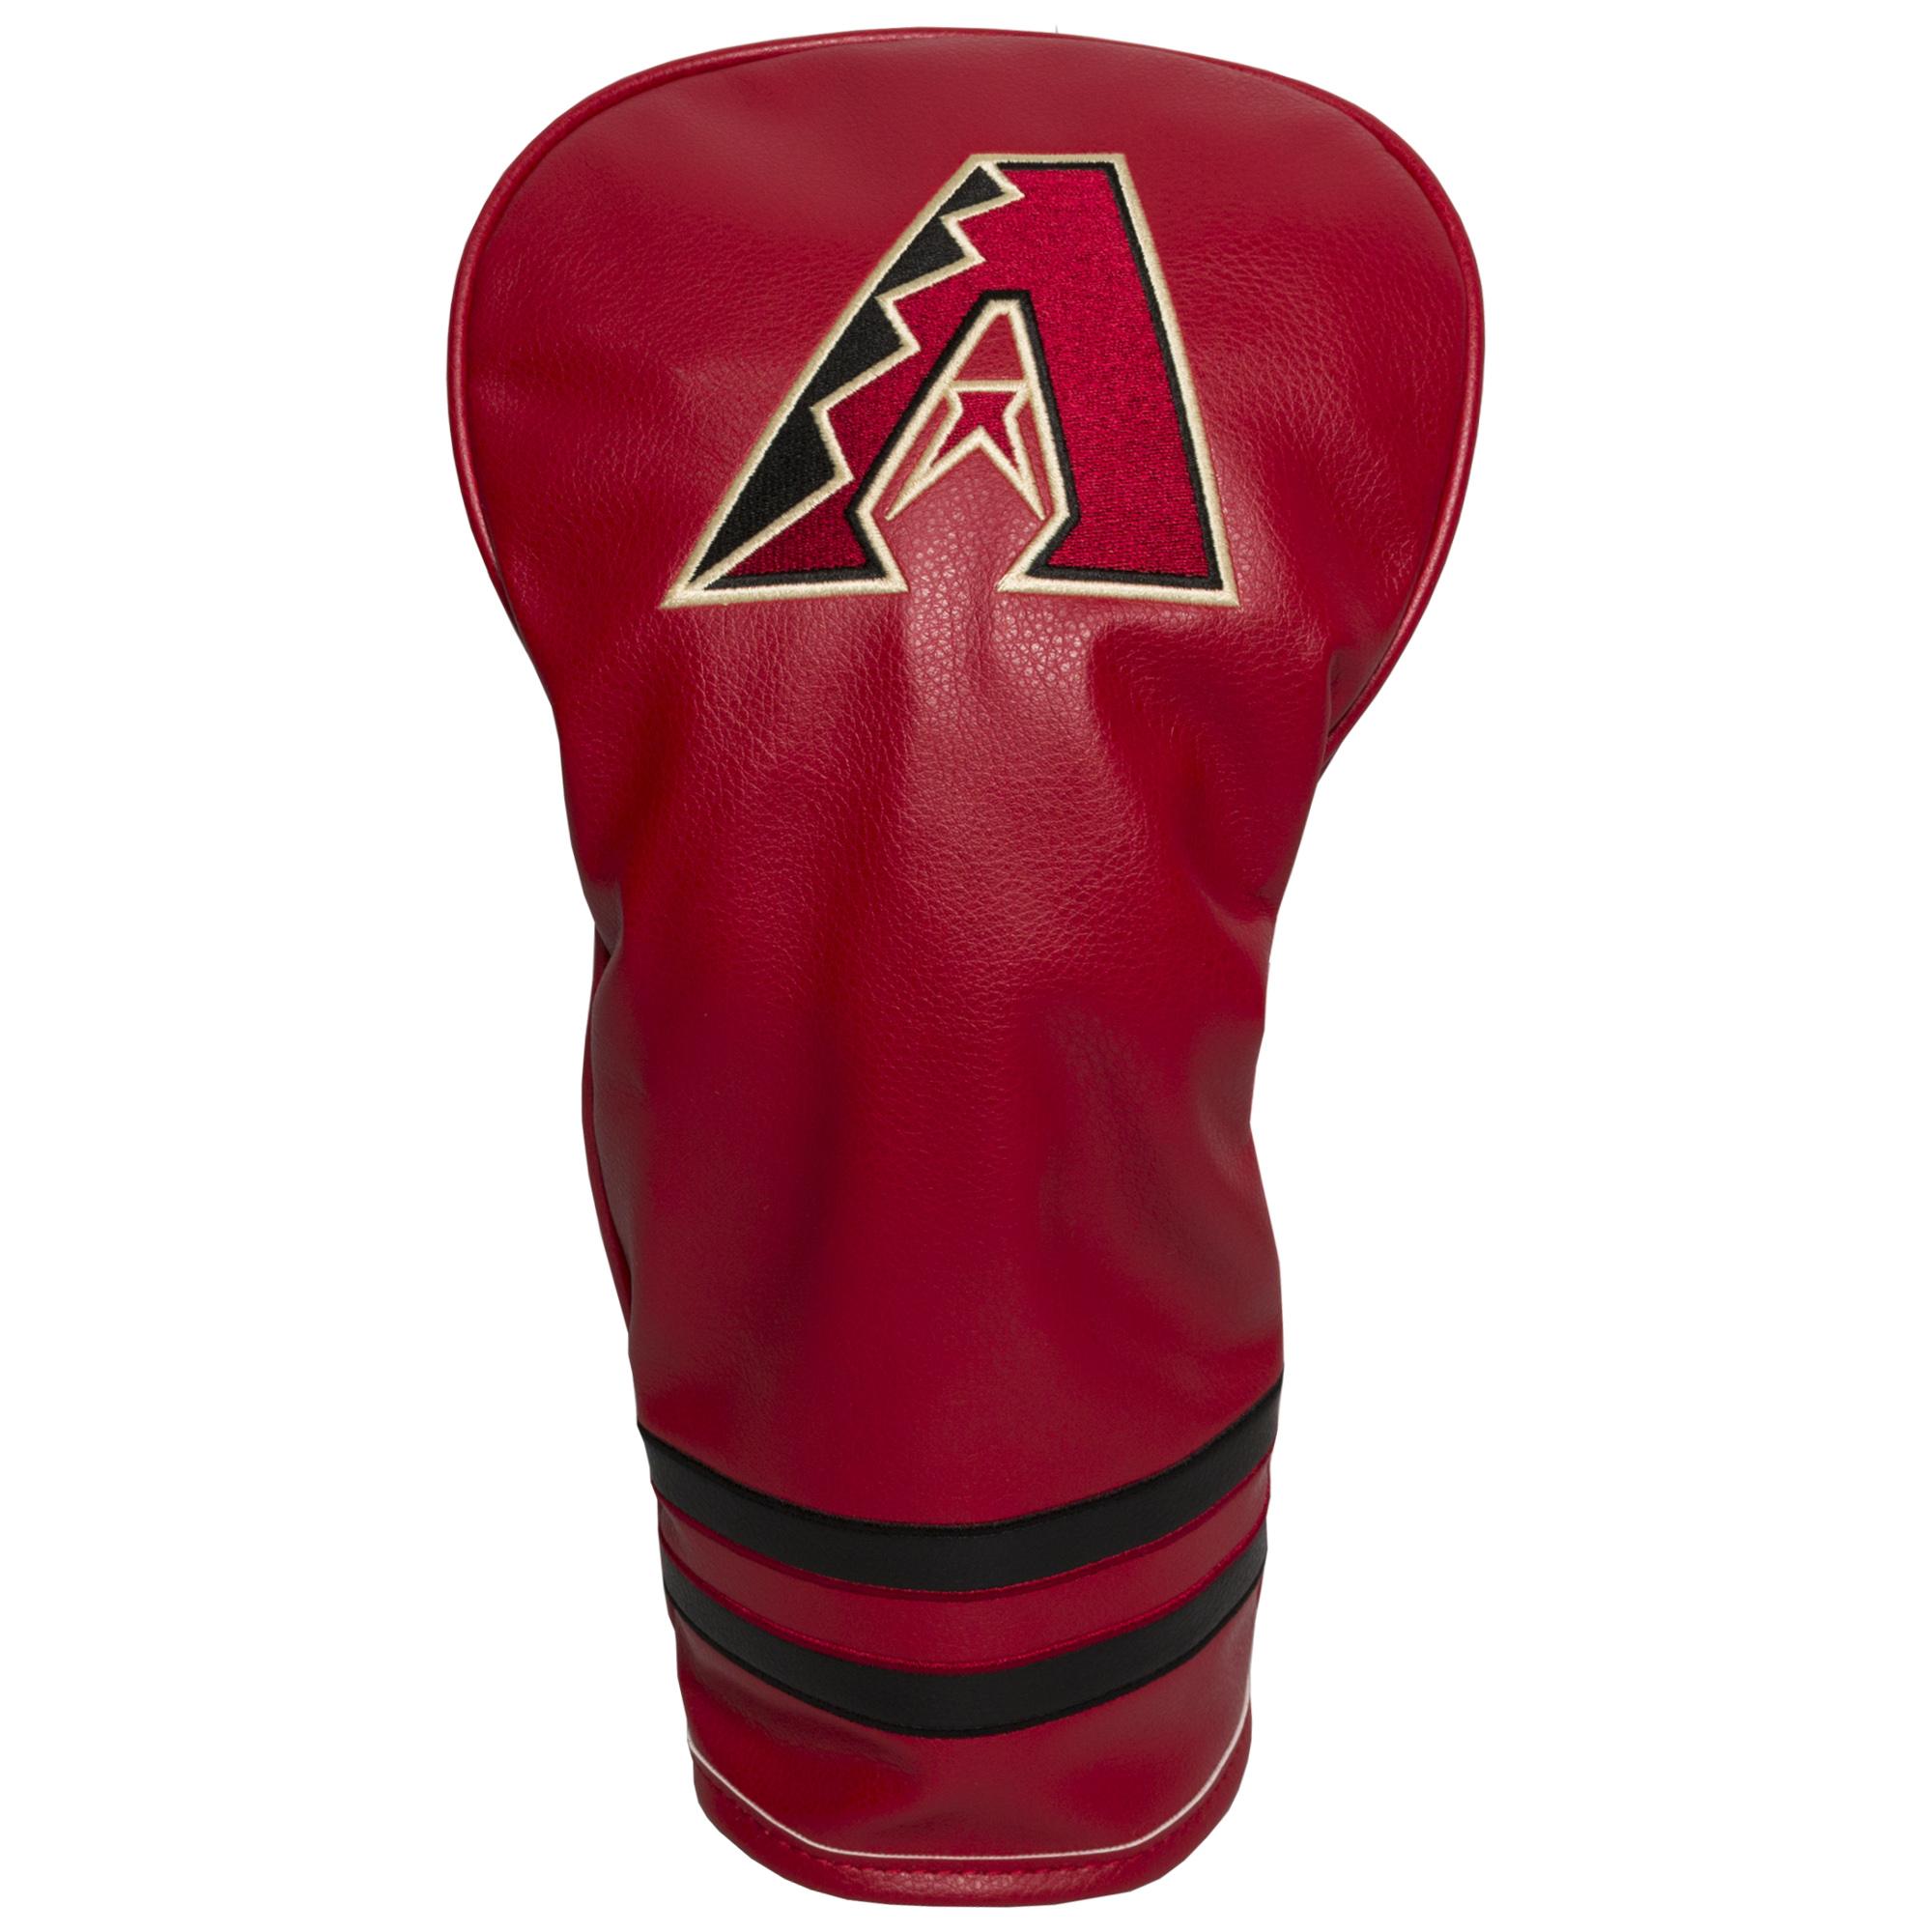 ef9b74456ce Arizona Diamondbacks Logo Golf Gifts and Accessories